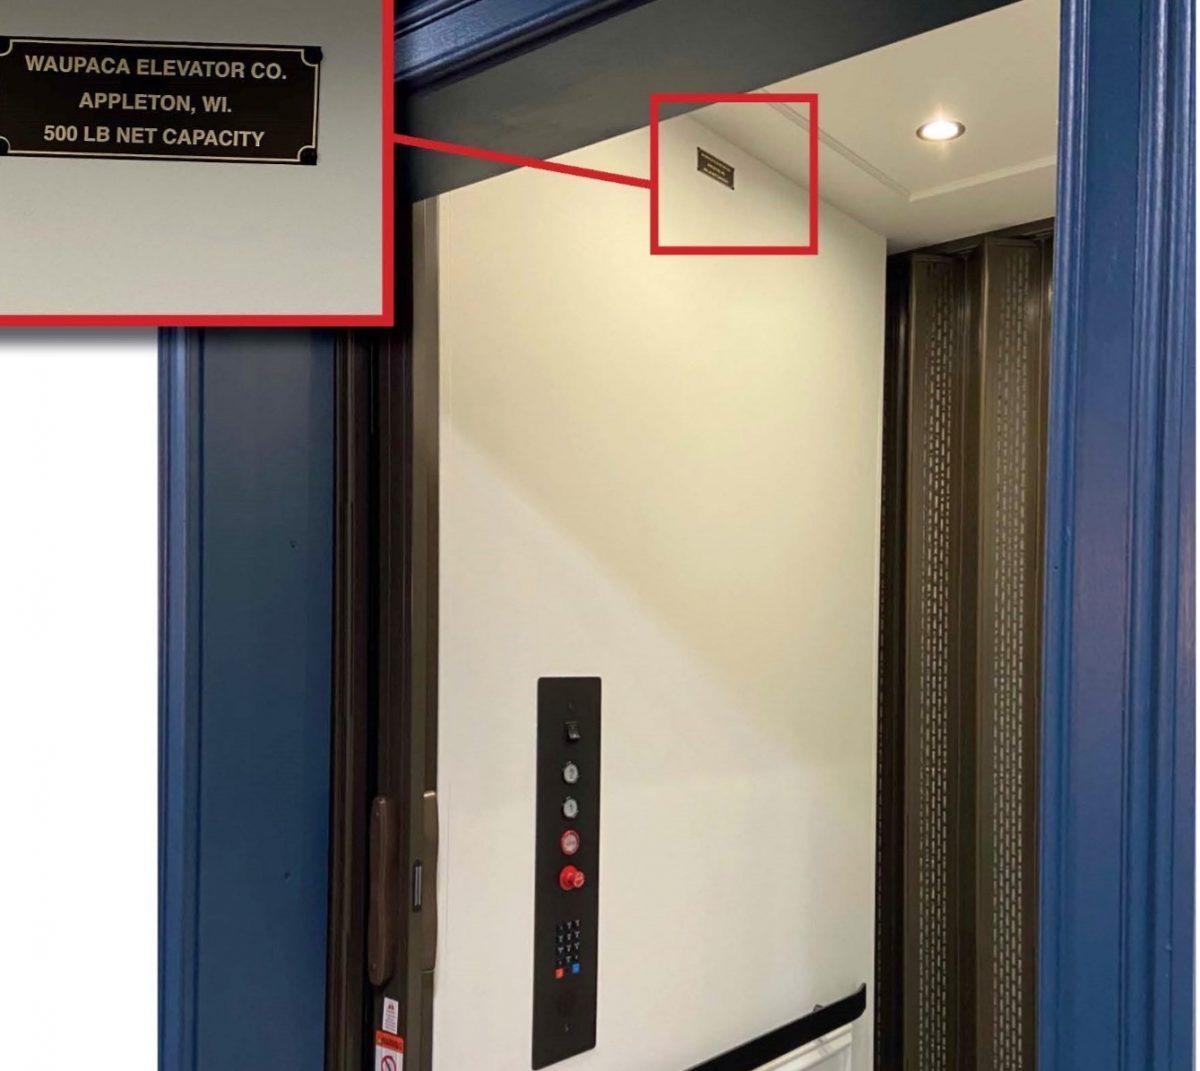 Waupaca Elevator